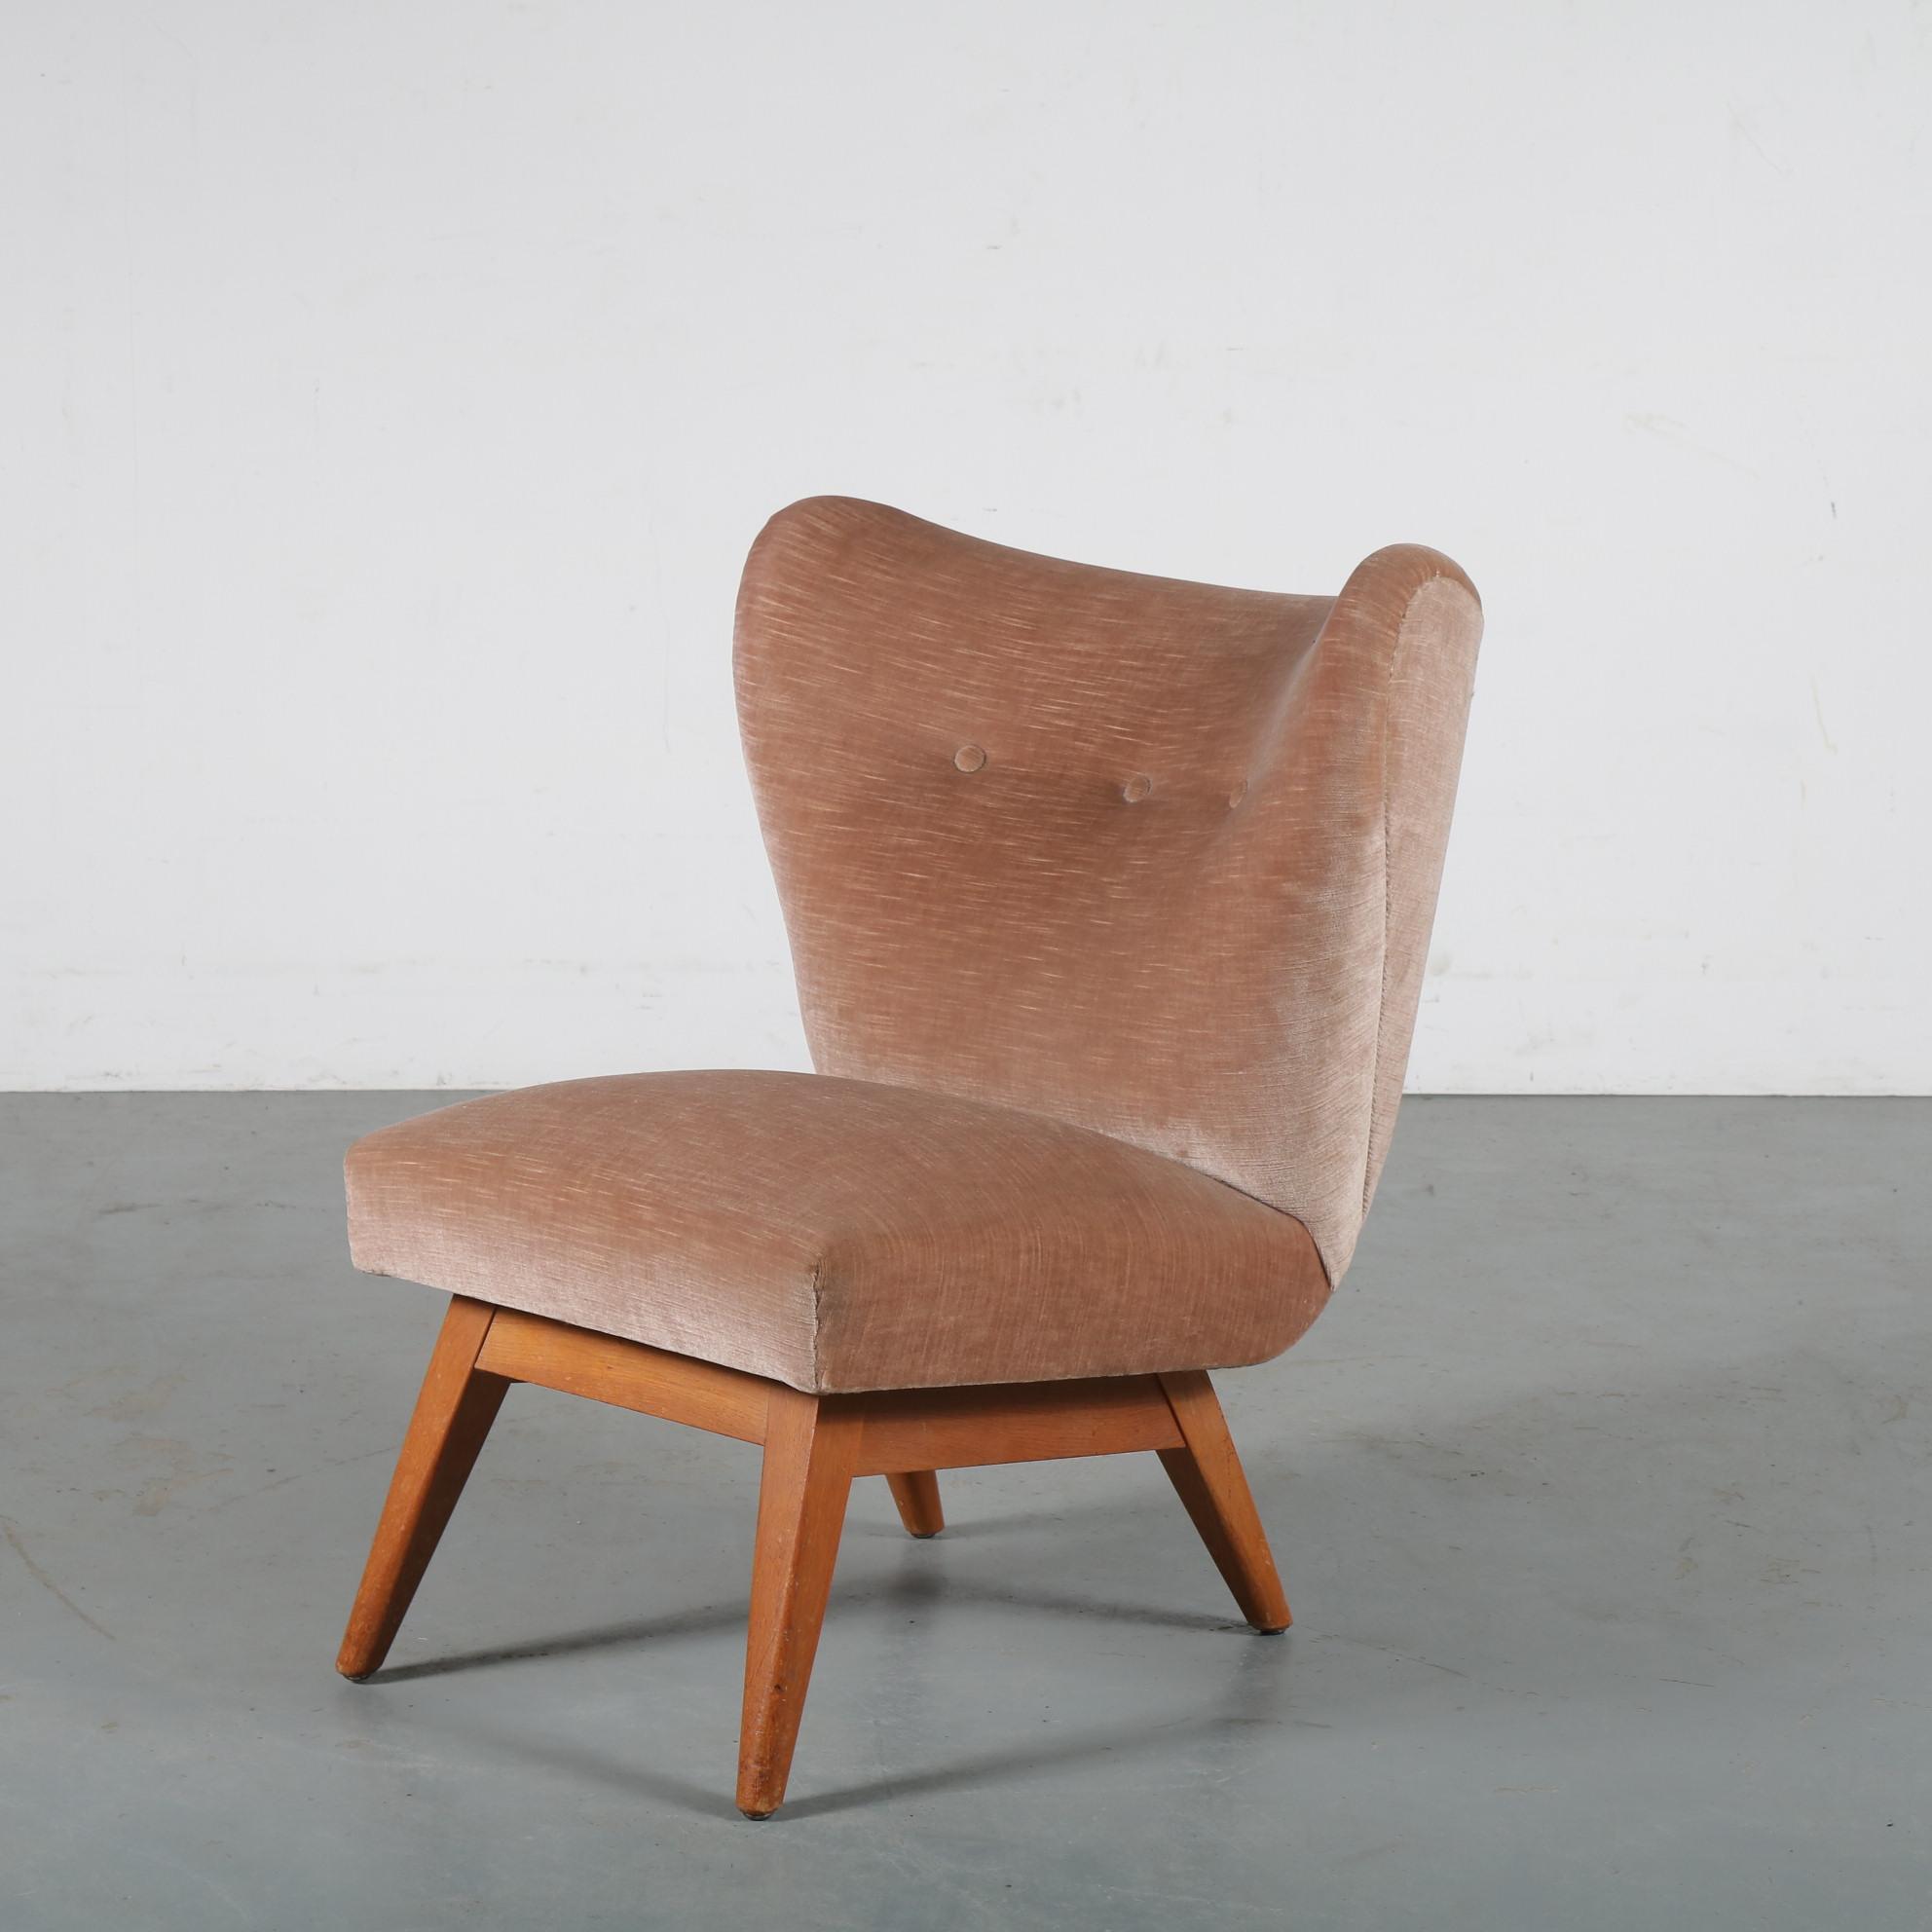 m24213 1950s Lovely styled cocktail chair in pink velvet on birch base